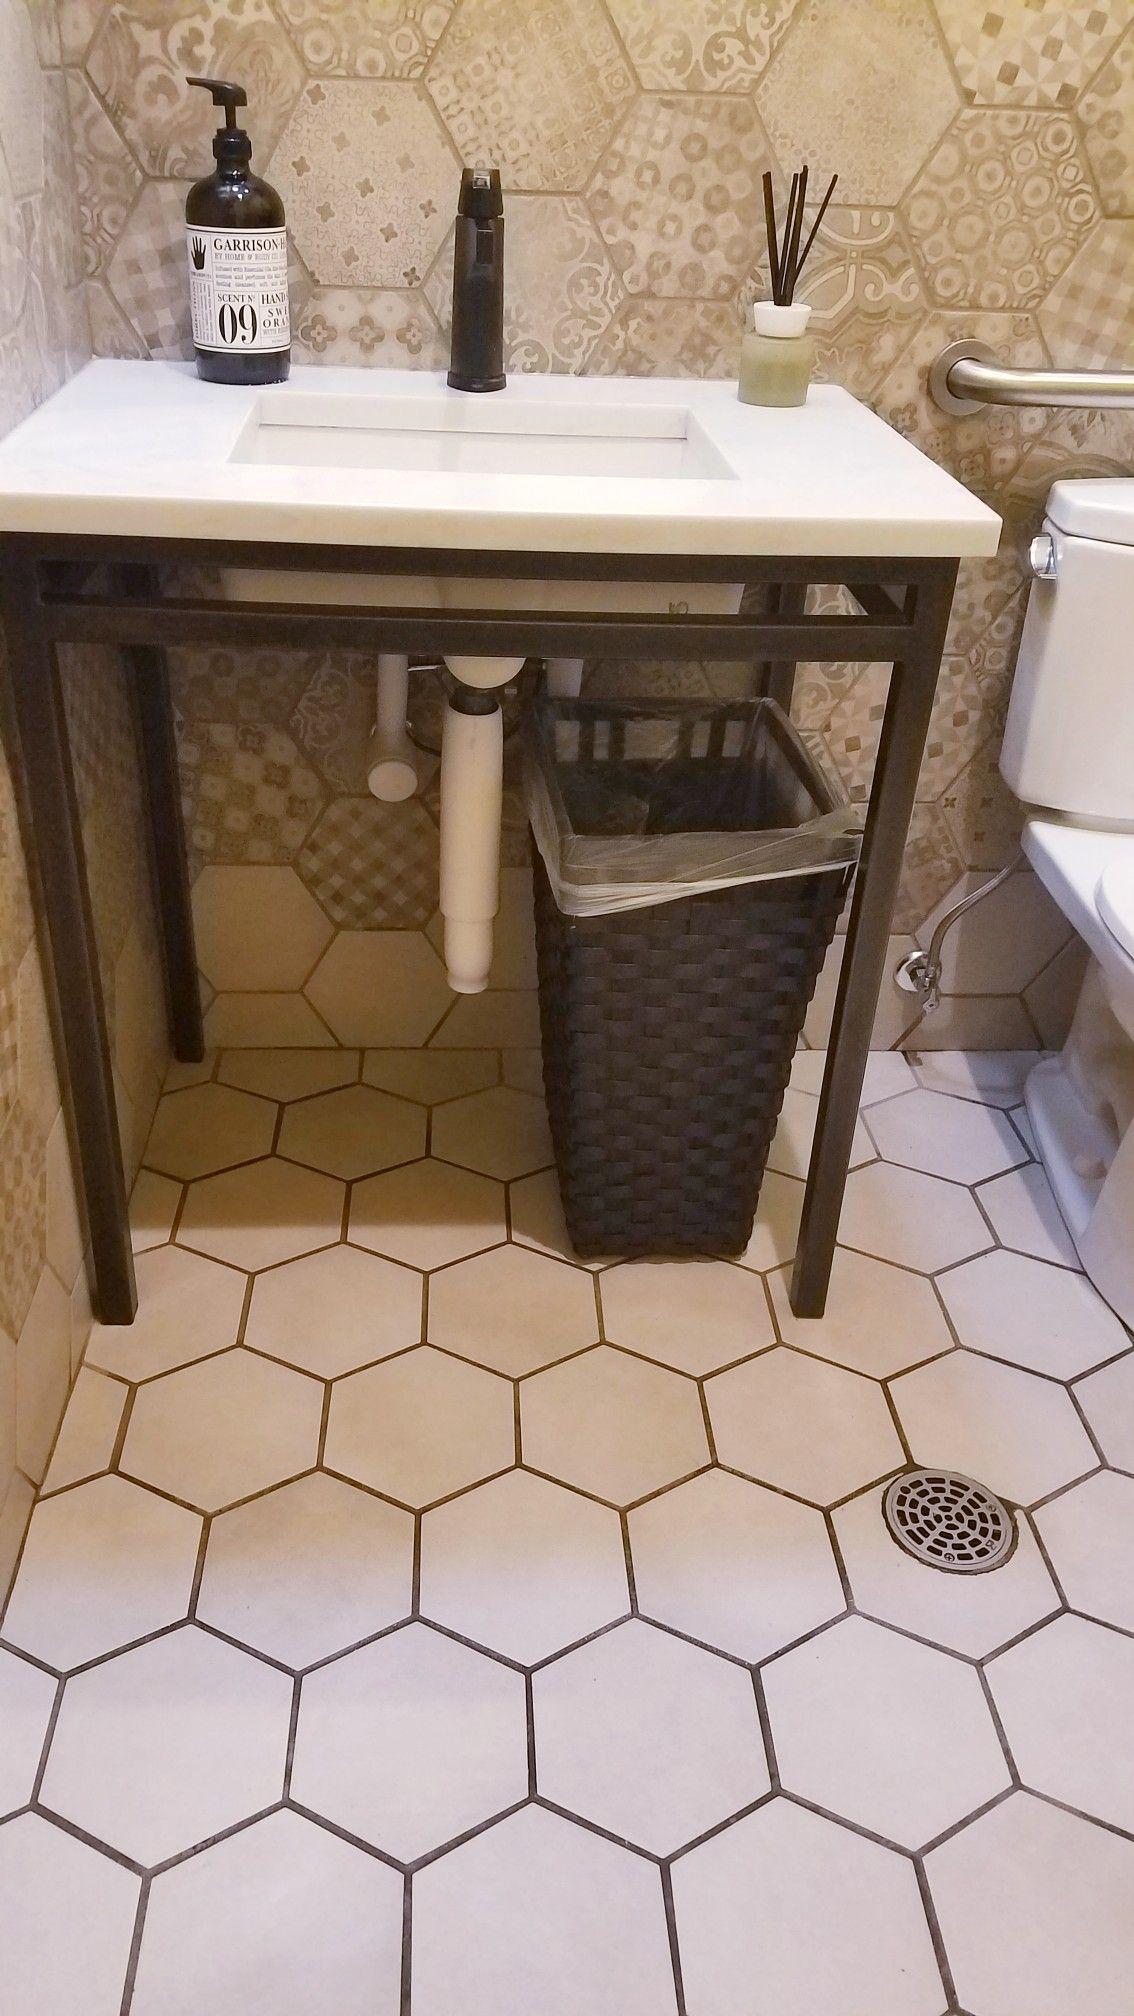 Commercial bathroom sink design bathroom sink design